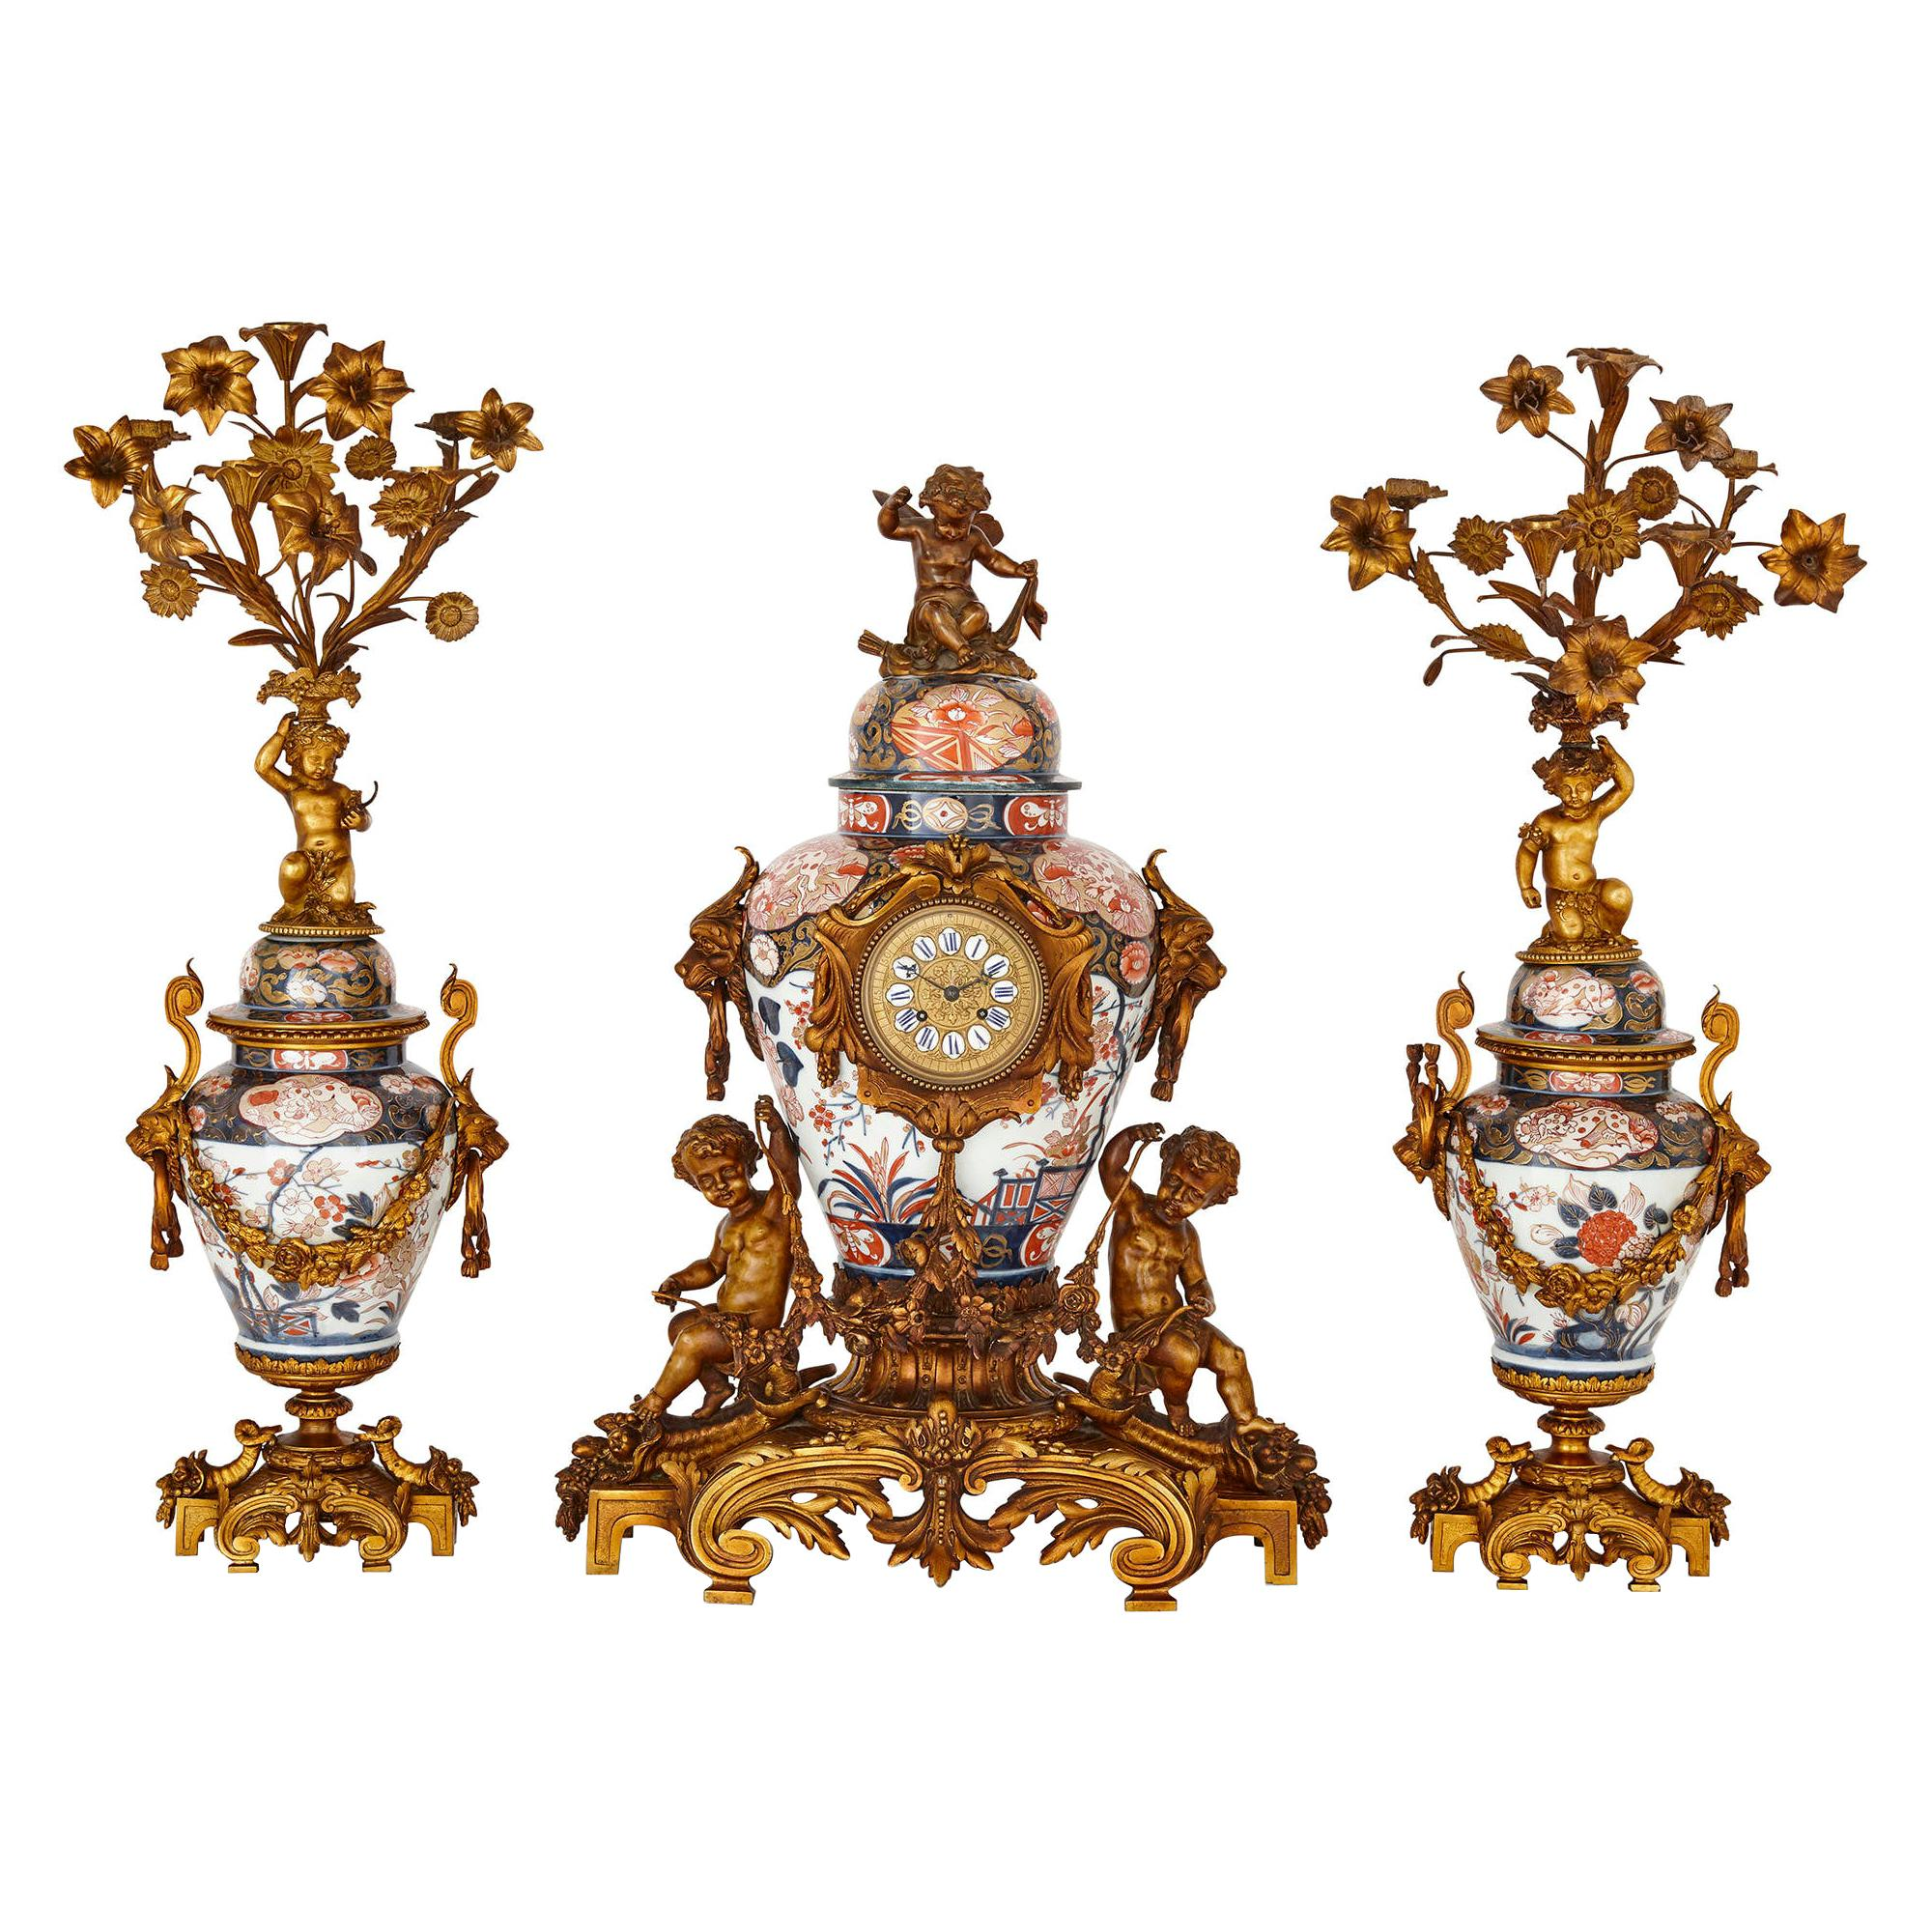 Japanese Imari Porcelain and Gilt Bronze Clock Set